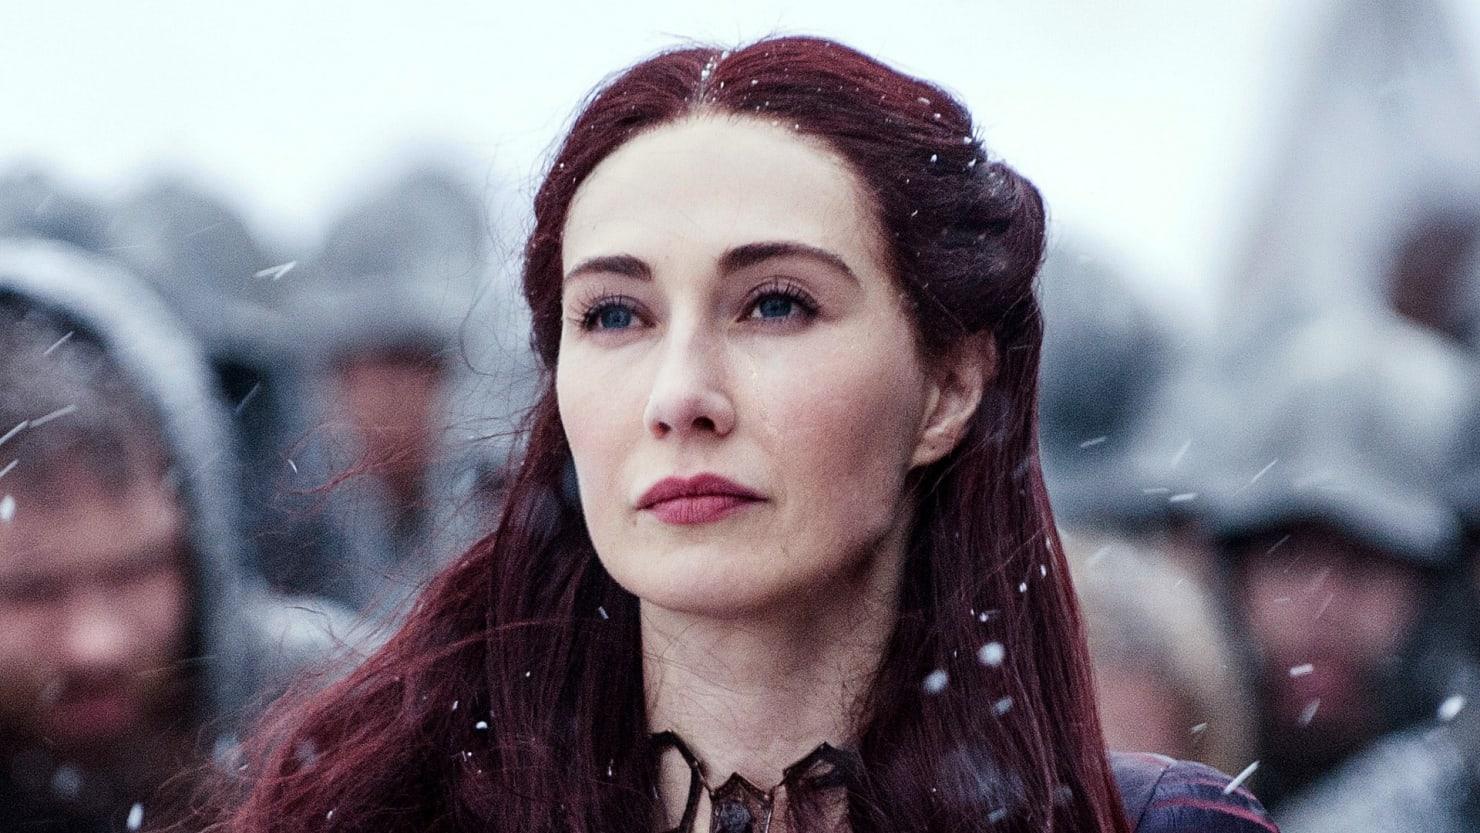 Melisandre - Game of Thrones Photo (34733401) - Fanpop